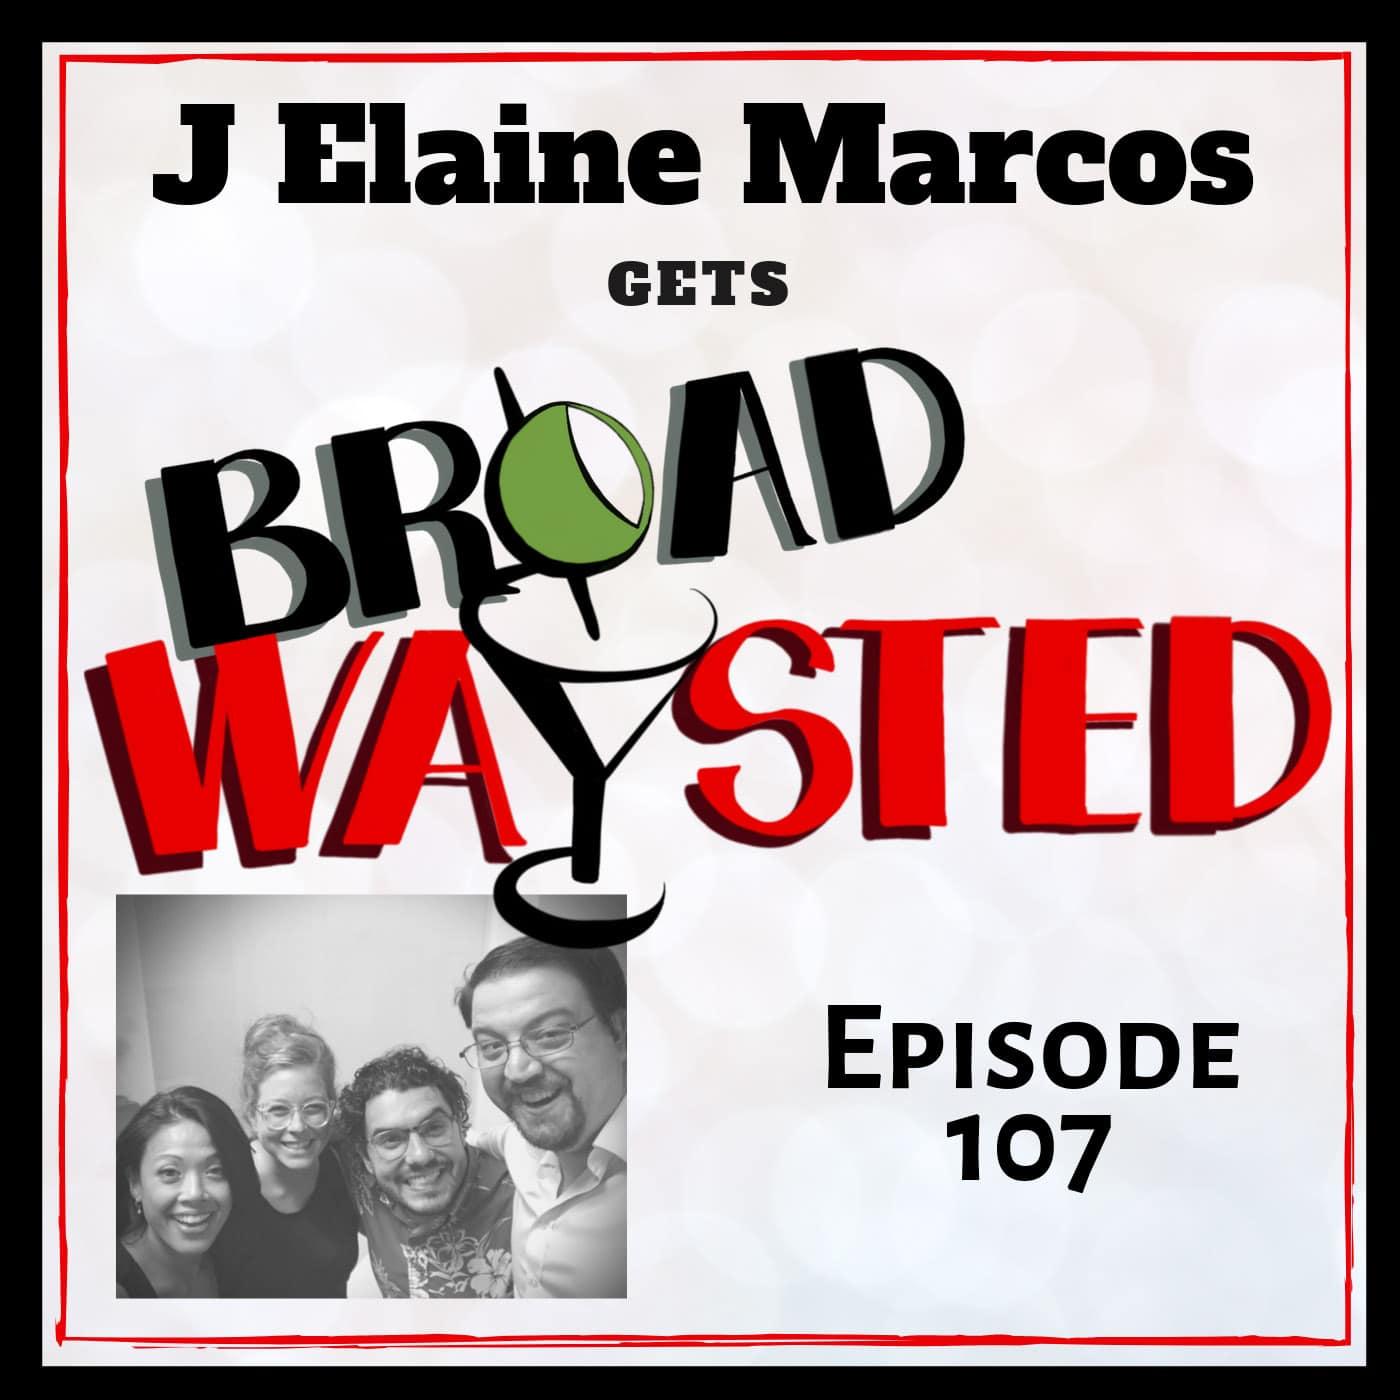 Broadwaysted Ep 107 J Elaine Marcos